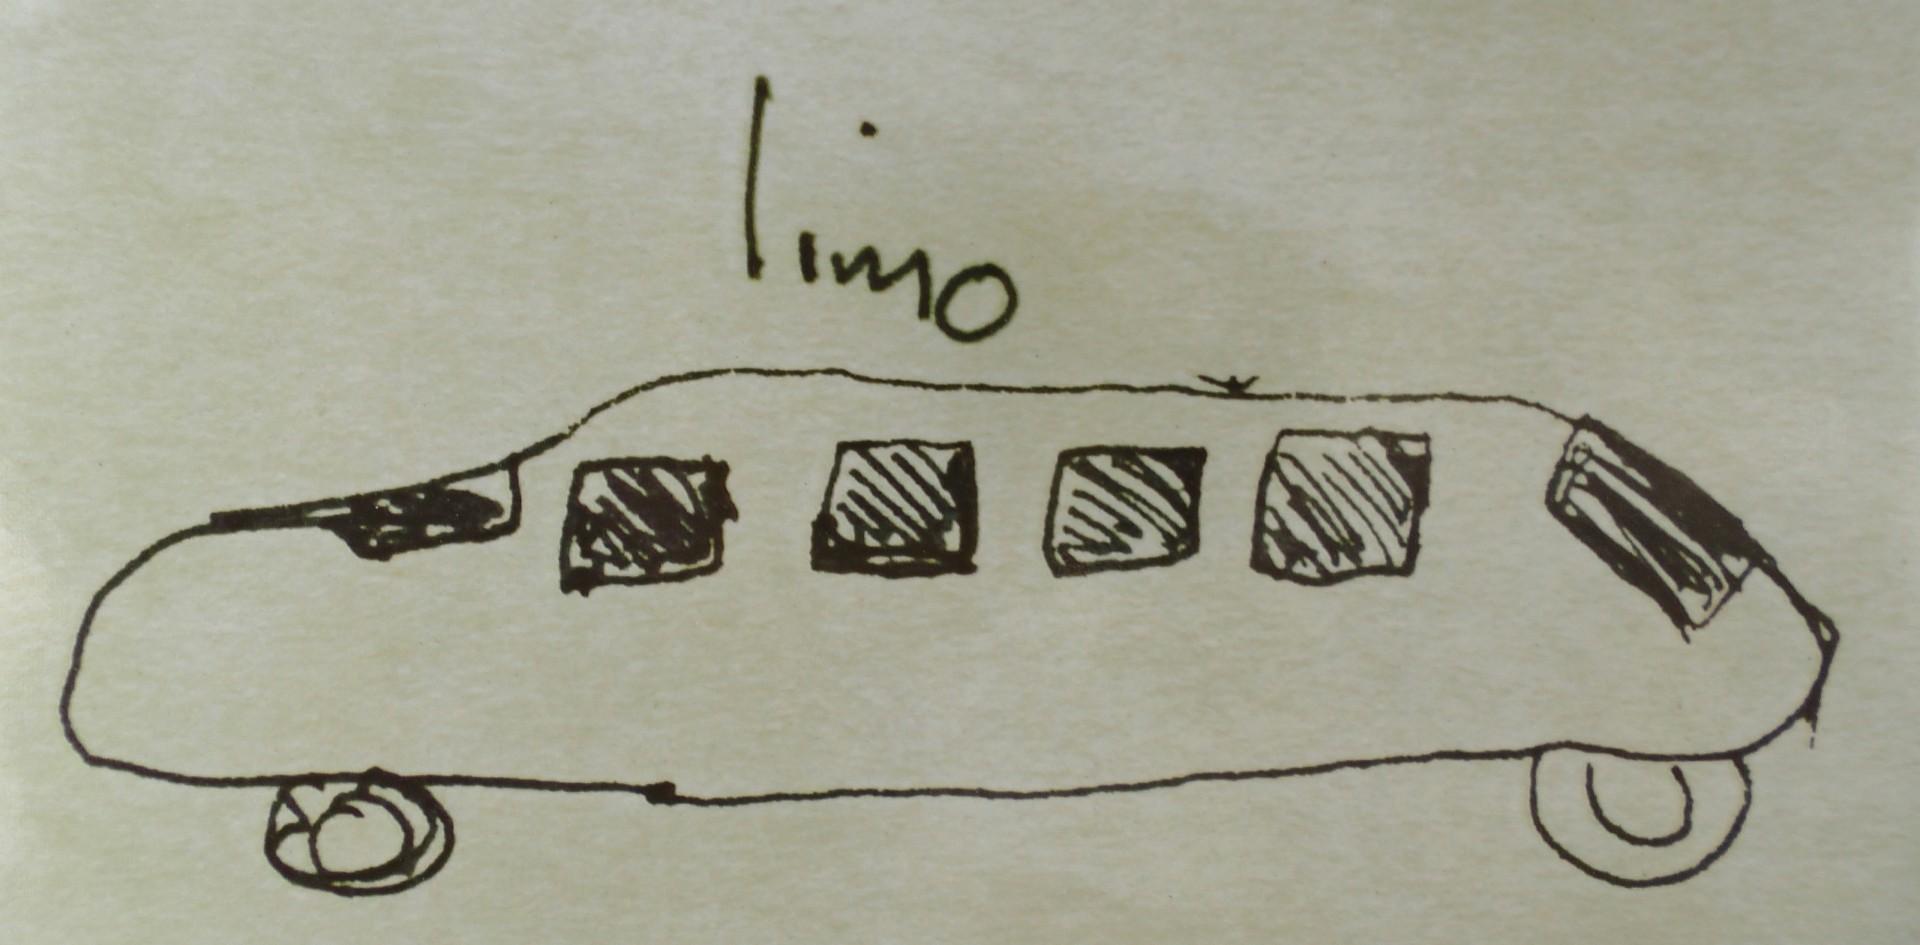 1920x945 Limousine Drawing Free Stock Photo